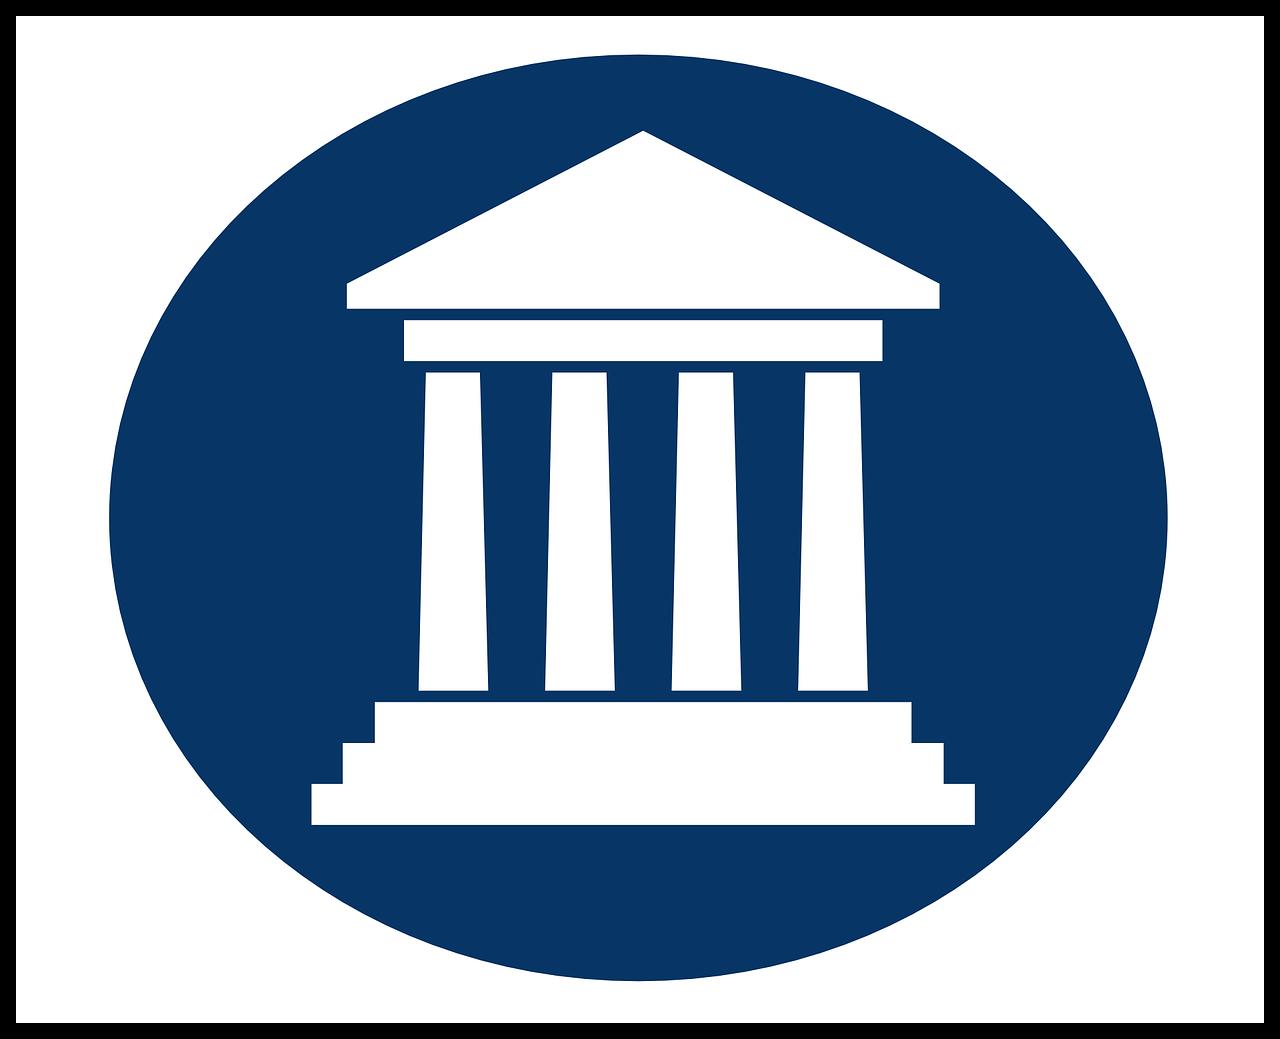 Pillars,roman,greek,historic,icon - free image from needpix.com